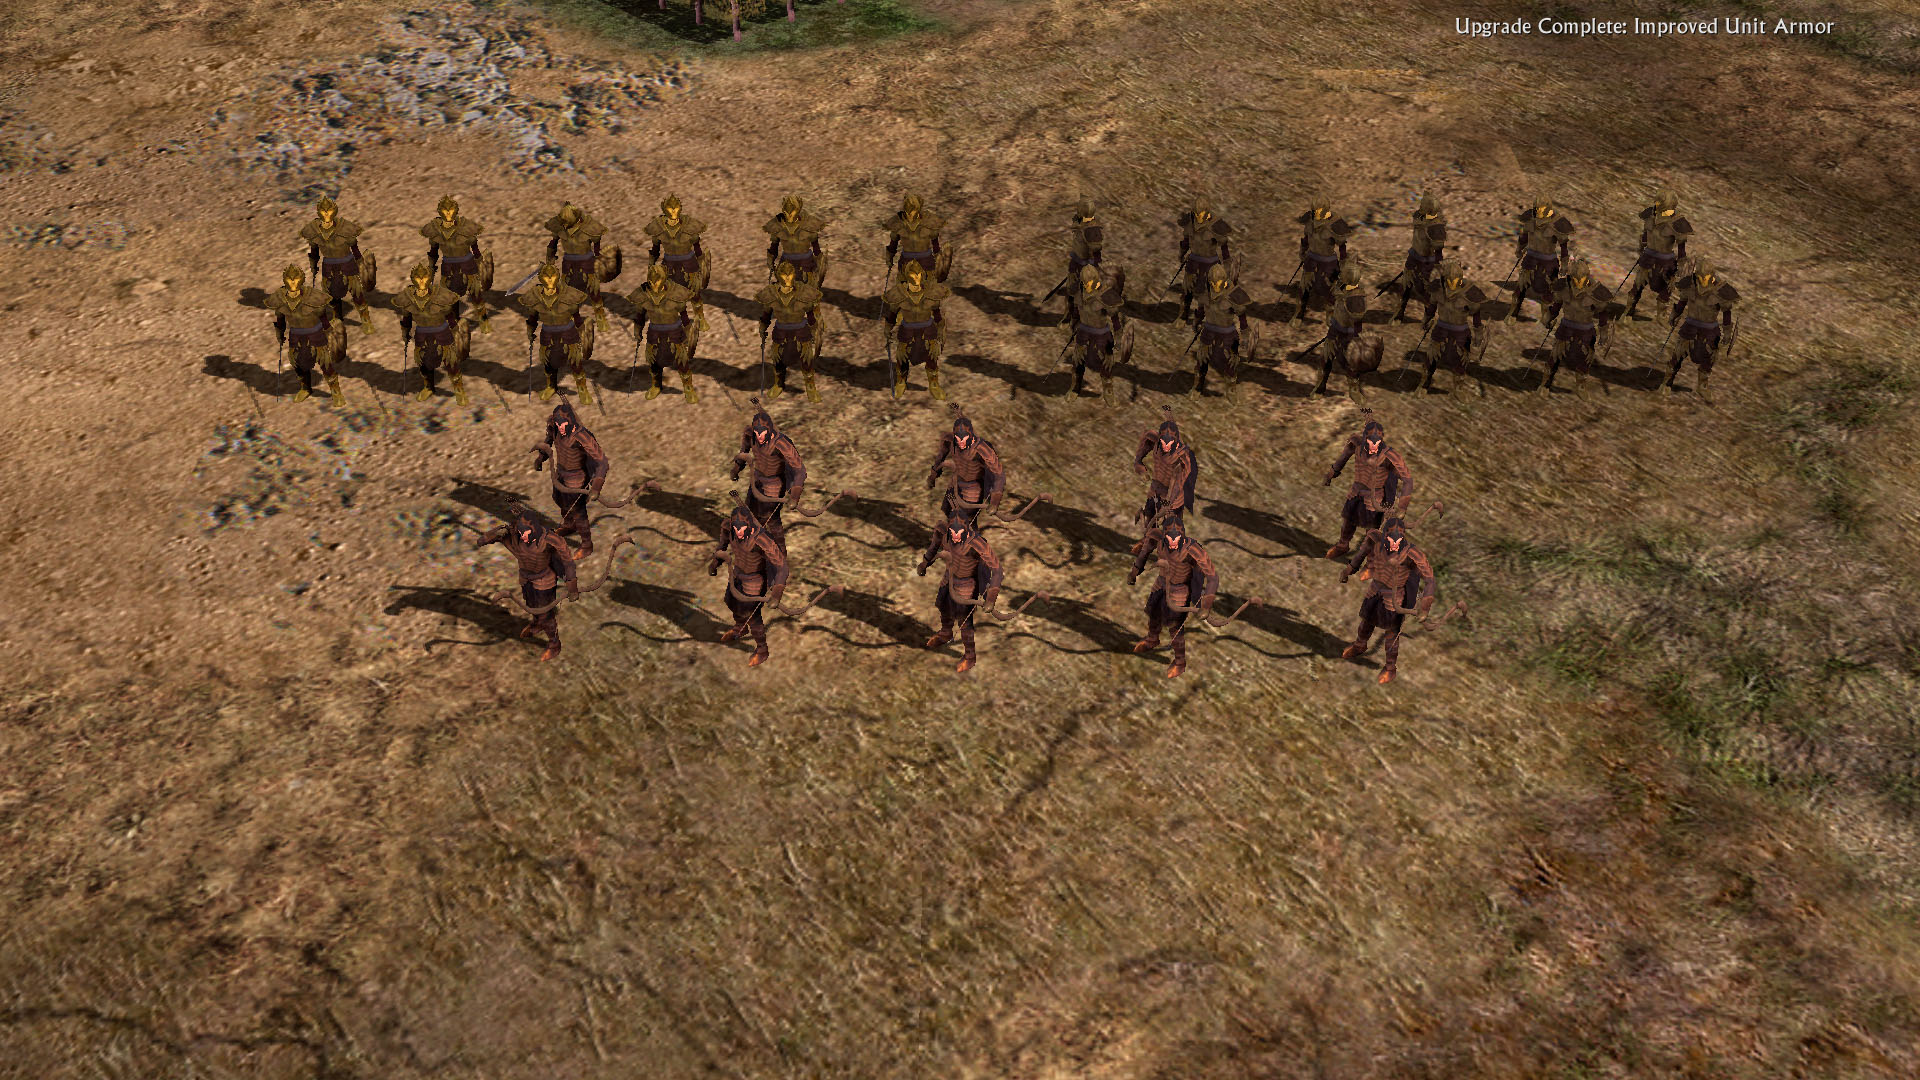 Dominion army